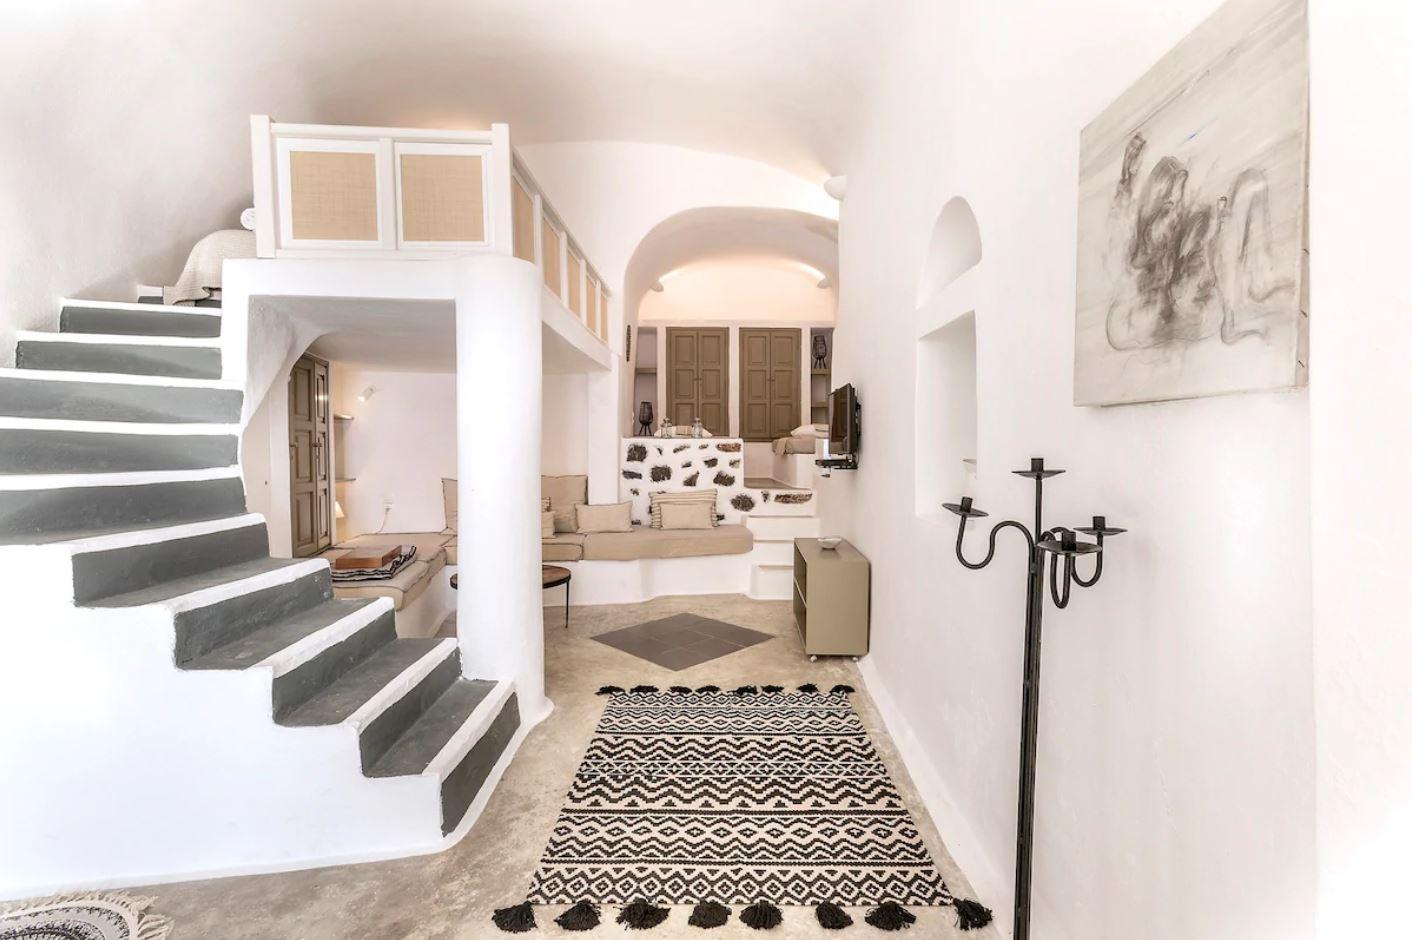 2. Beautiful Traditional Home in Santorini - Airbnb Santorini